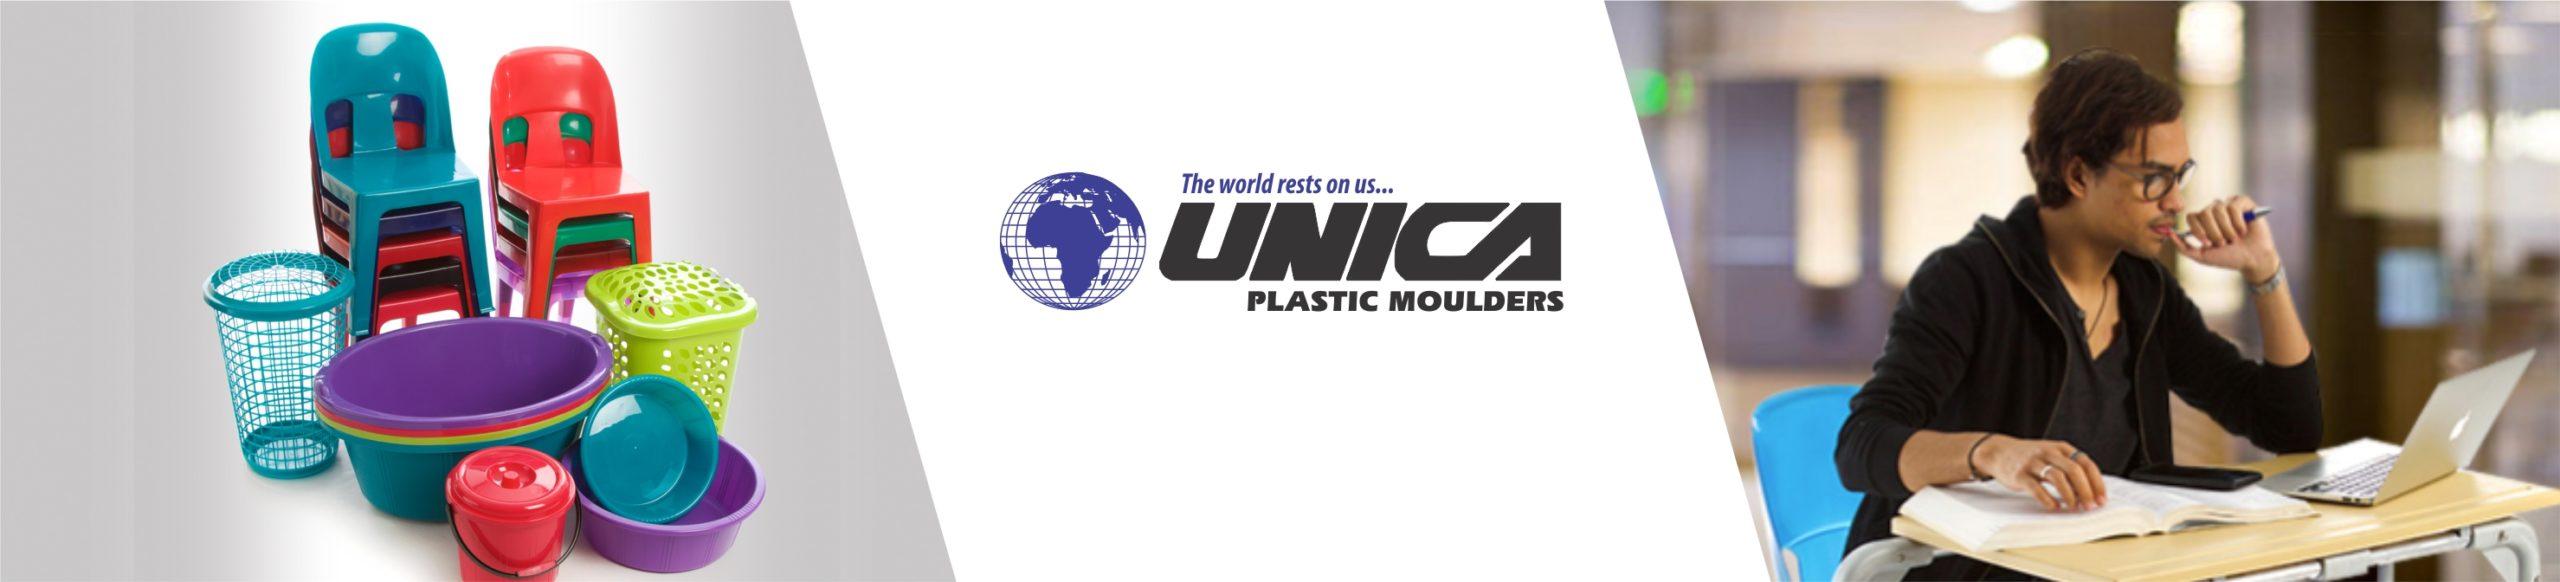 Unica Plastics